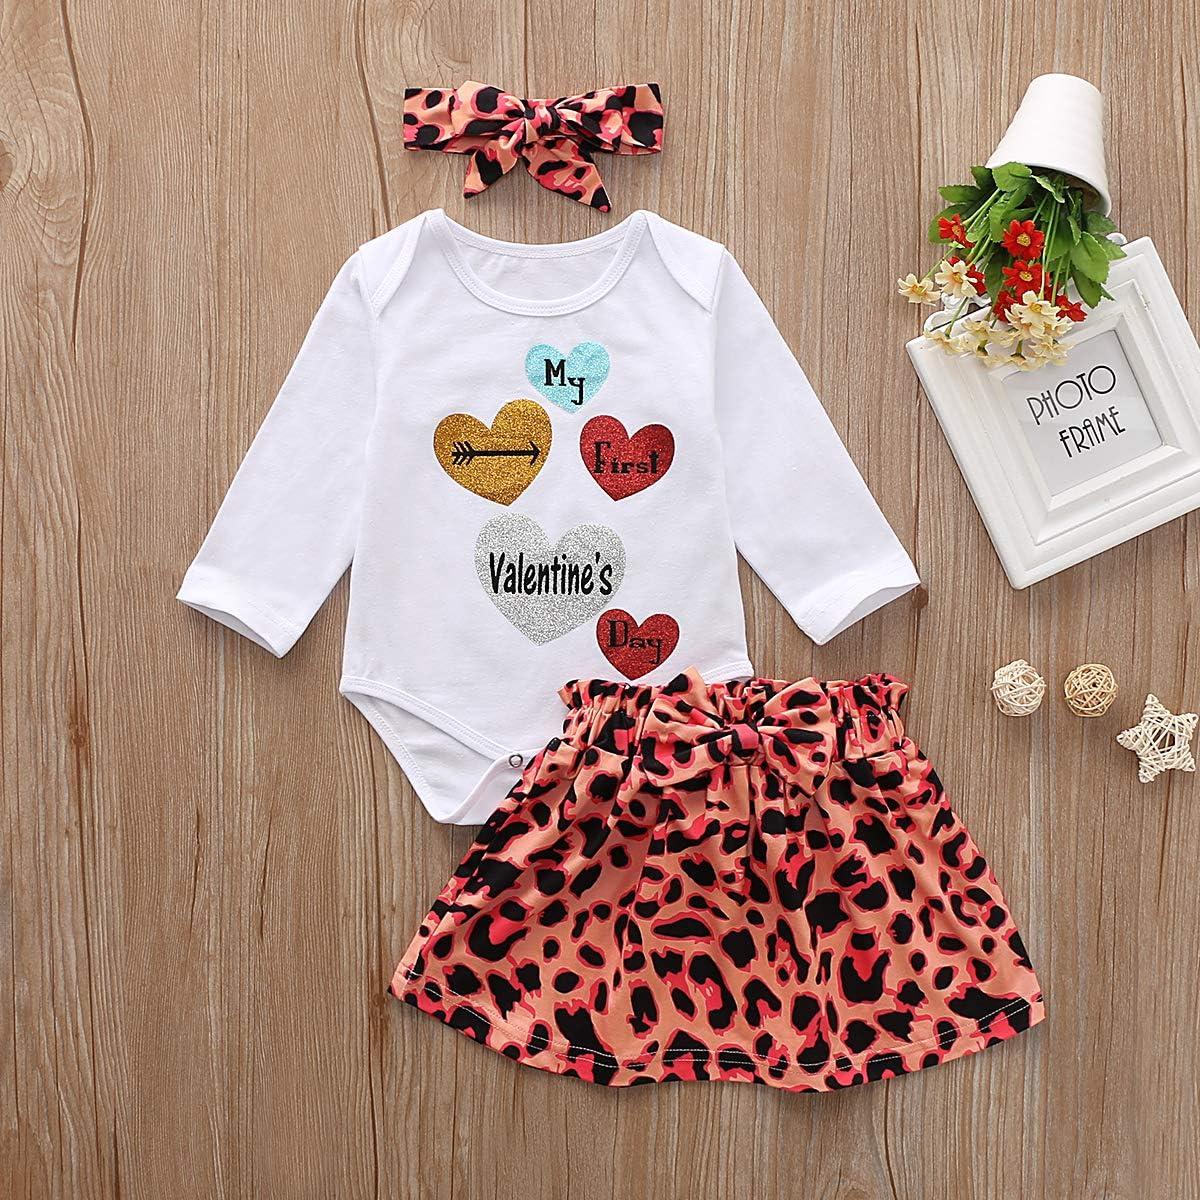 Newborn Baby Girl Valentines Day Romper Top Tutu Dress Leg Warmers Headband 4Pcs Outfit